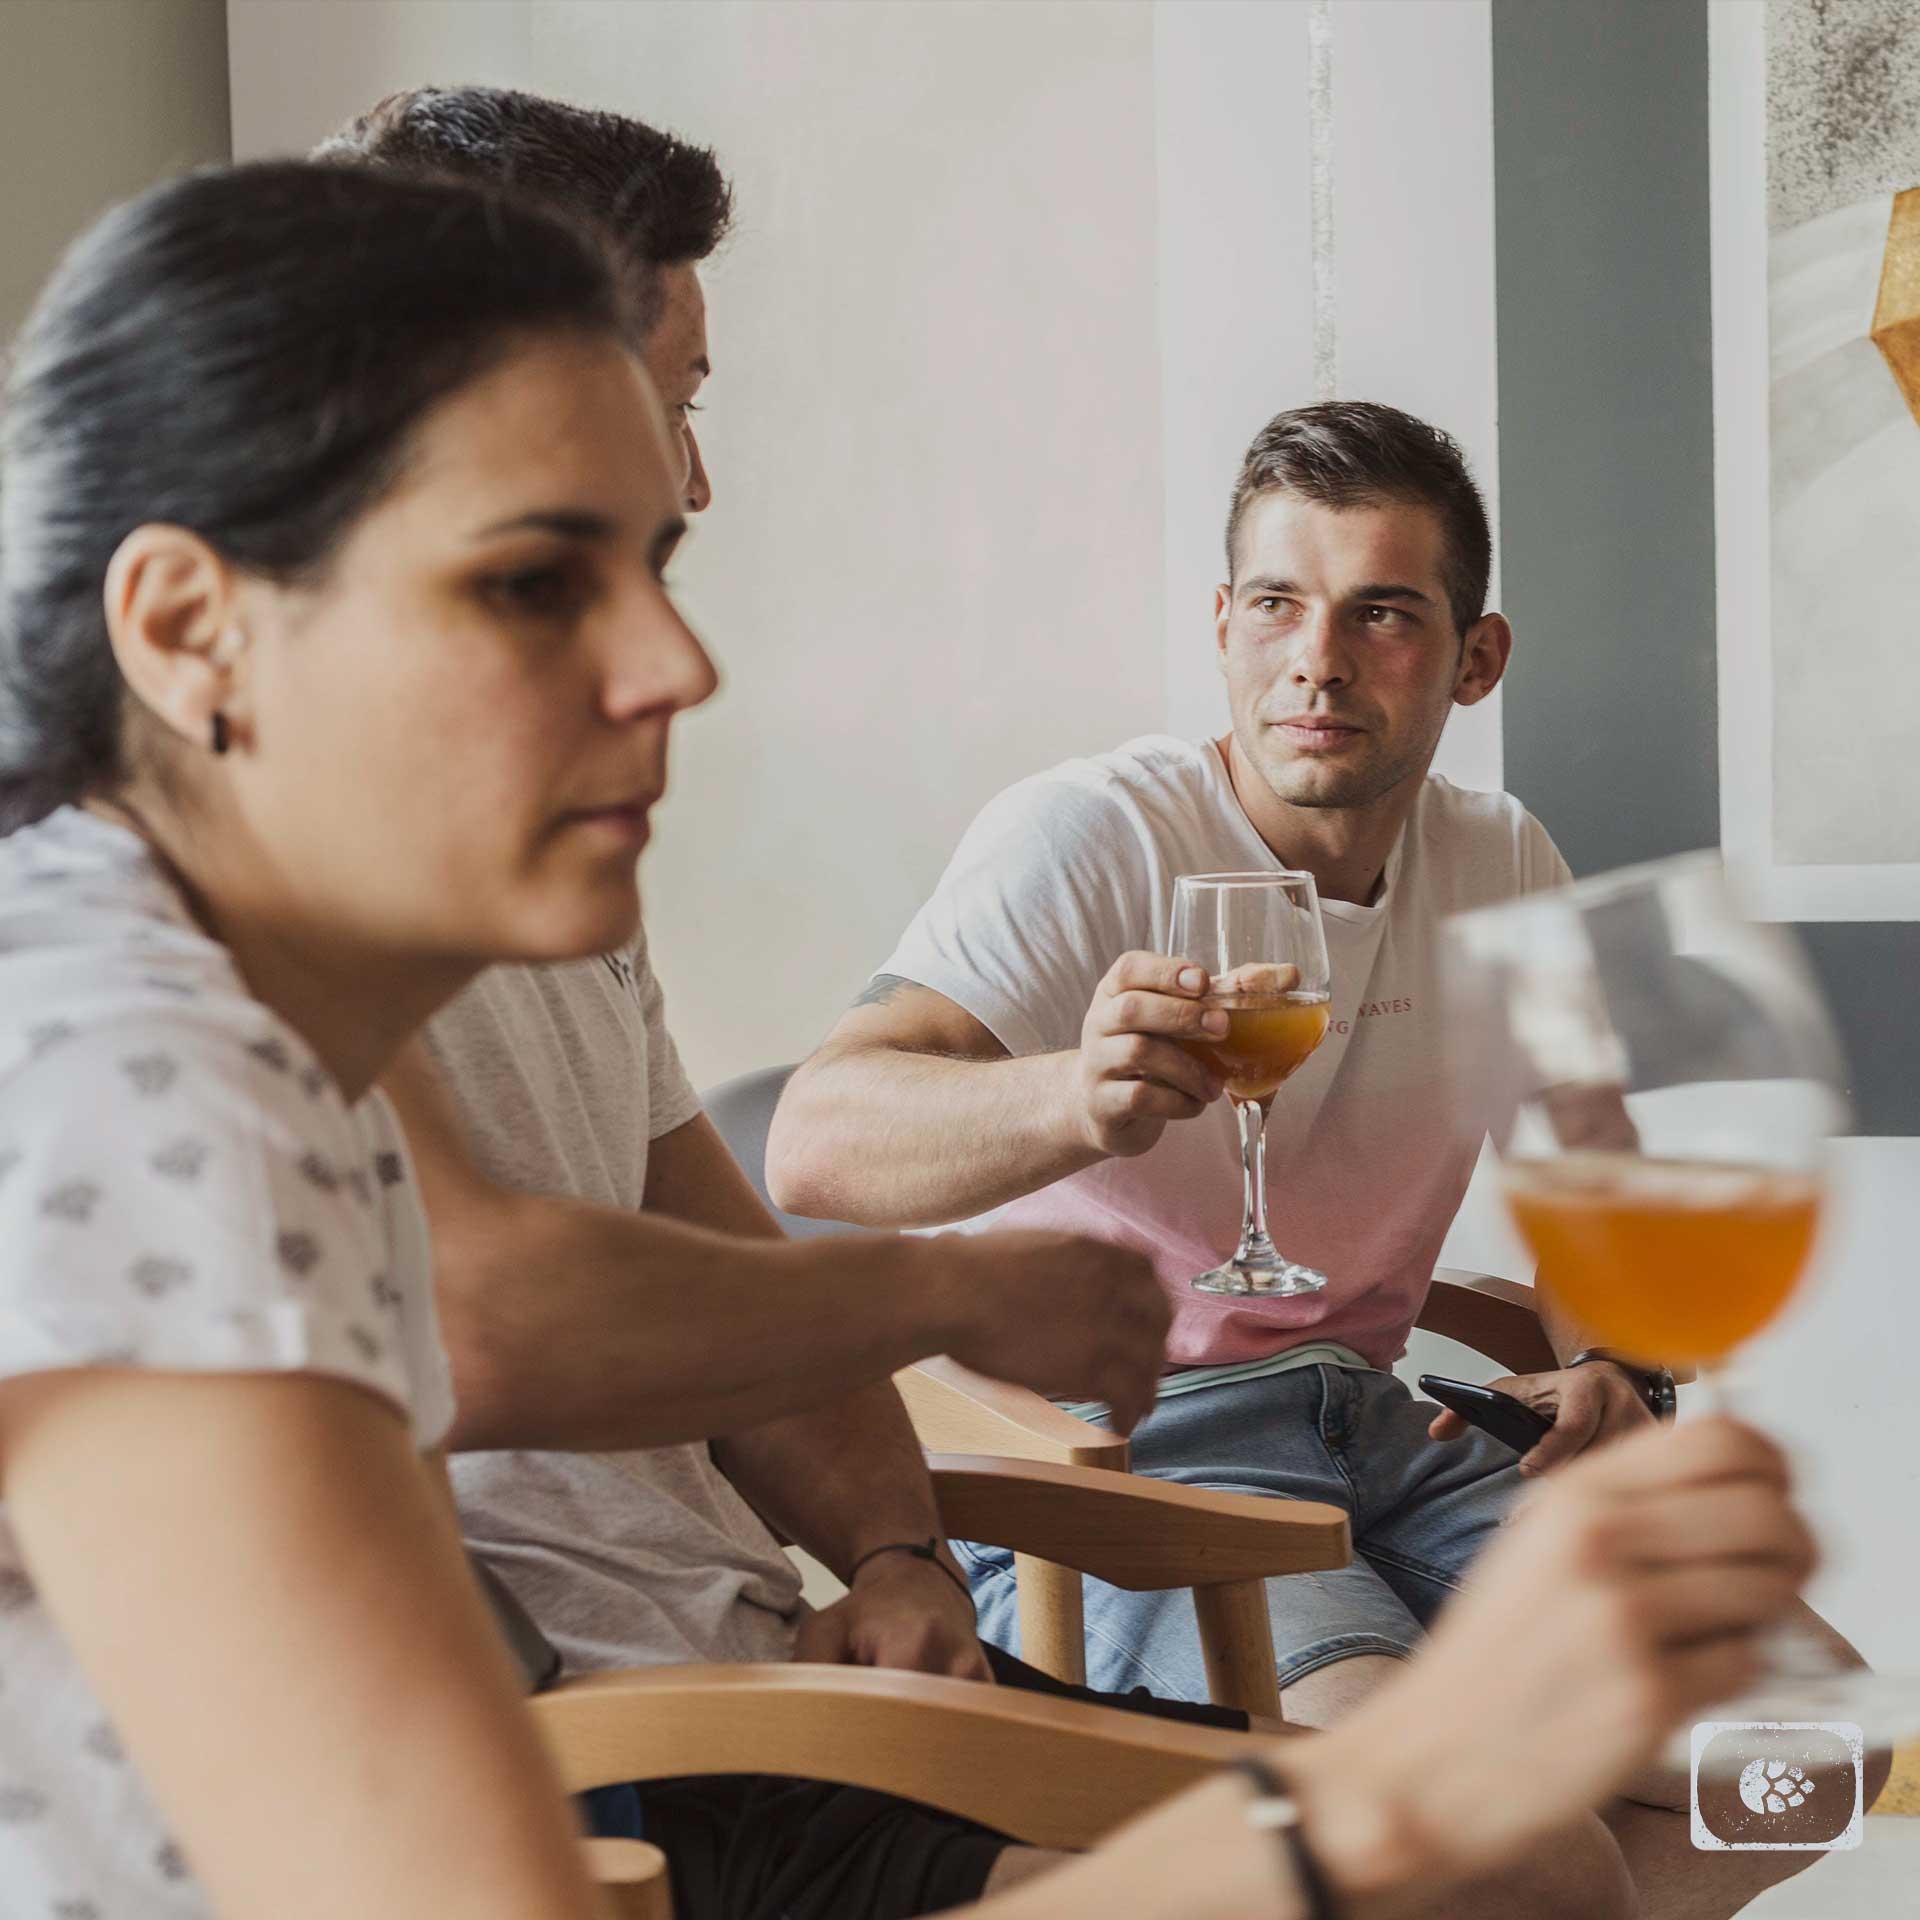 Cerveza Artesana Online Abaceria